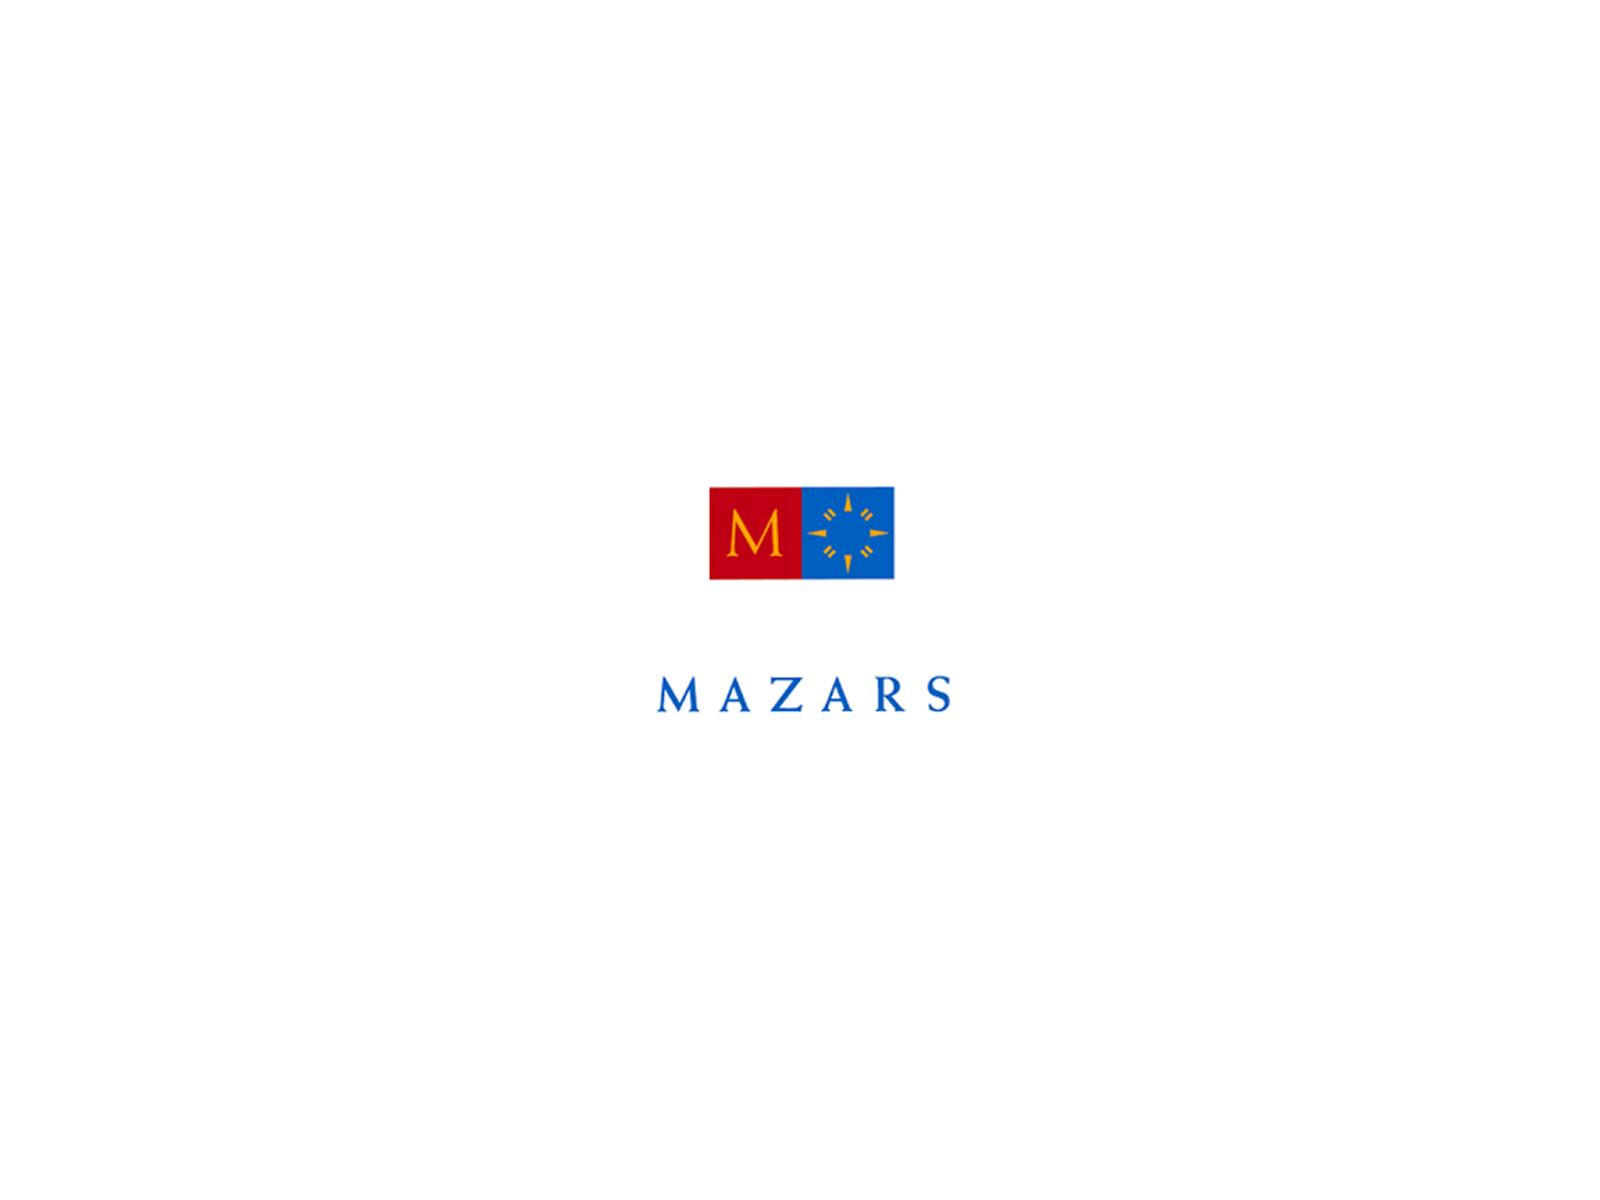 Mazars.